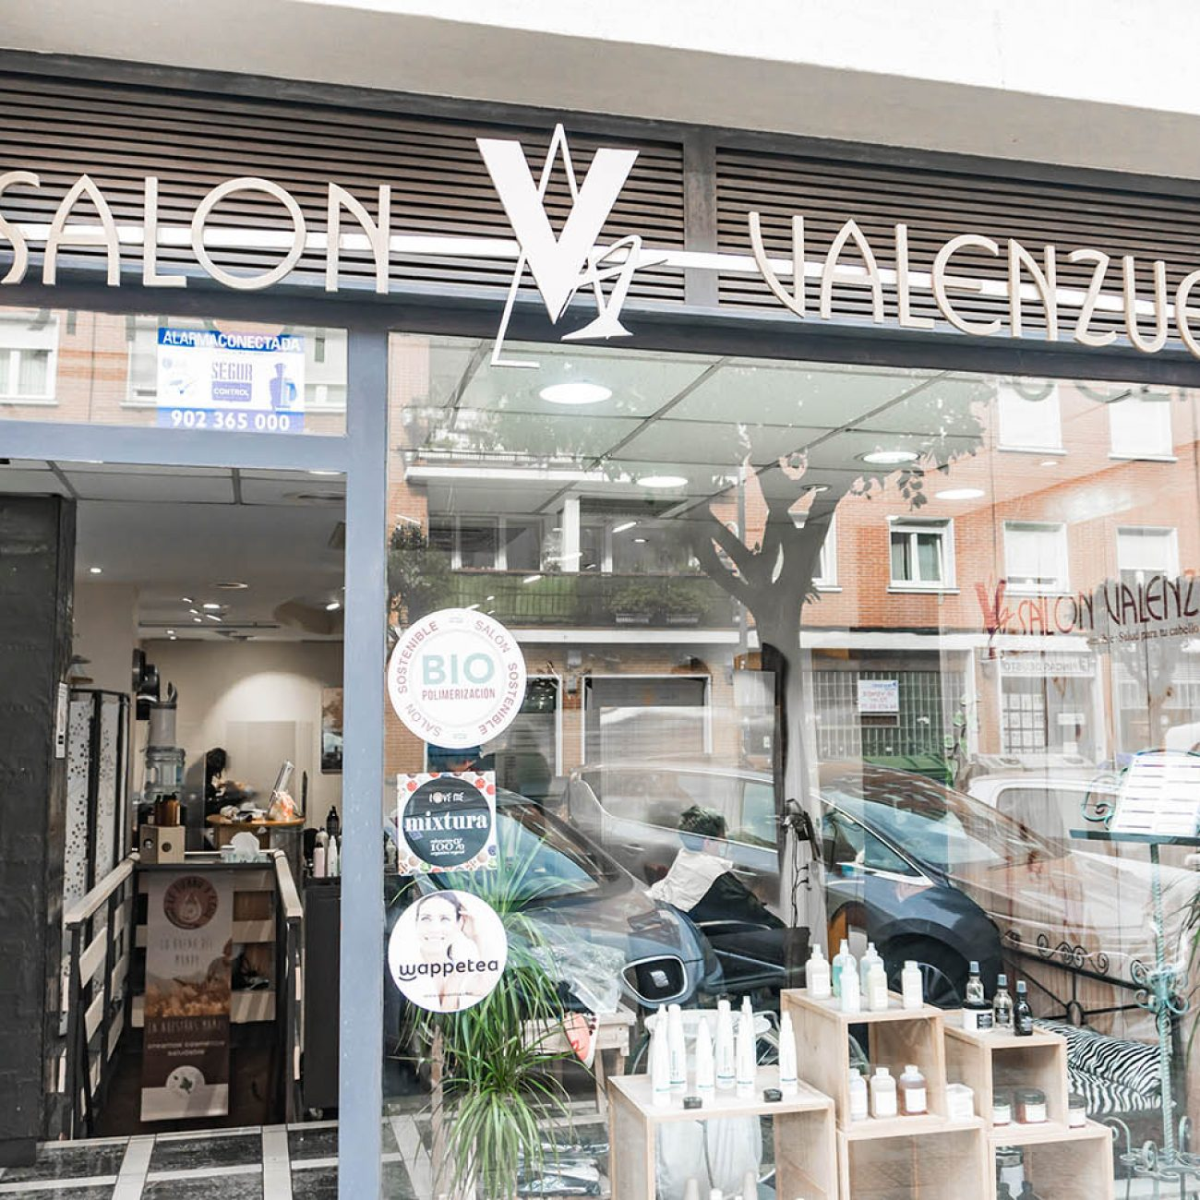 Salón Valenzuela, peluquería en Deusto